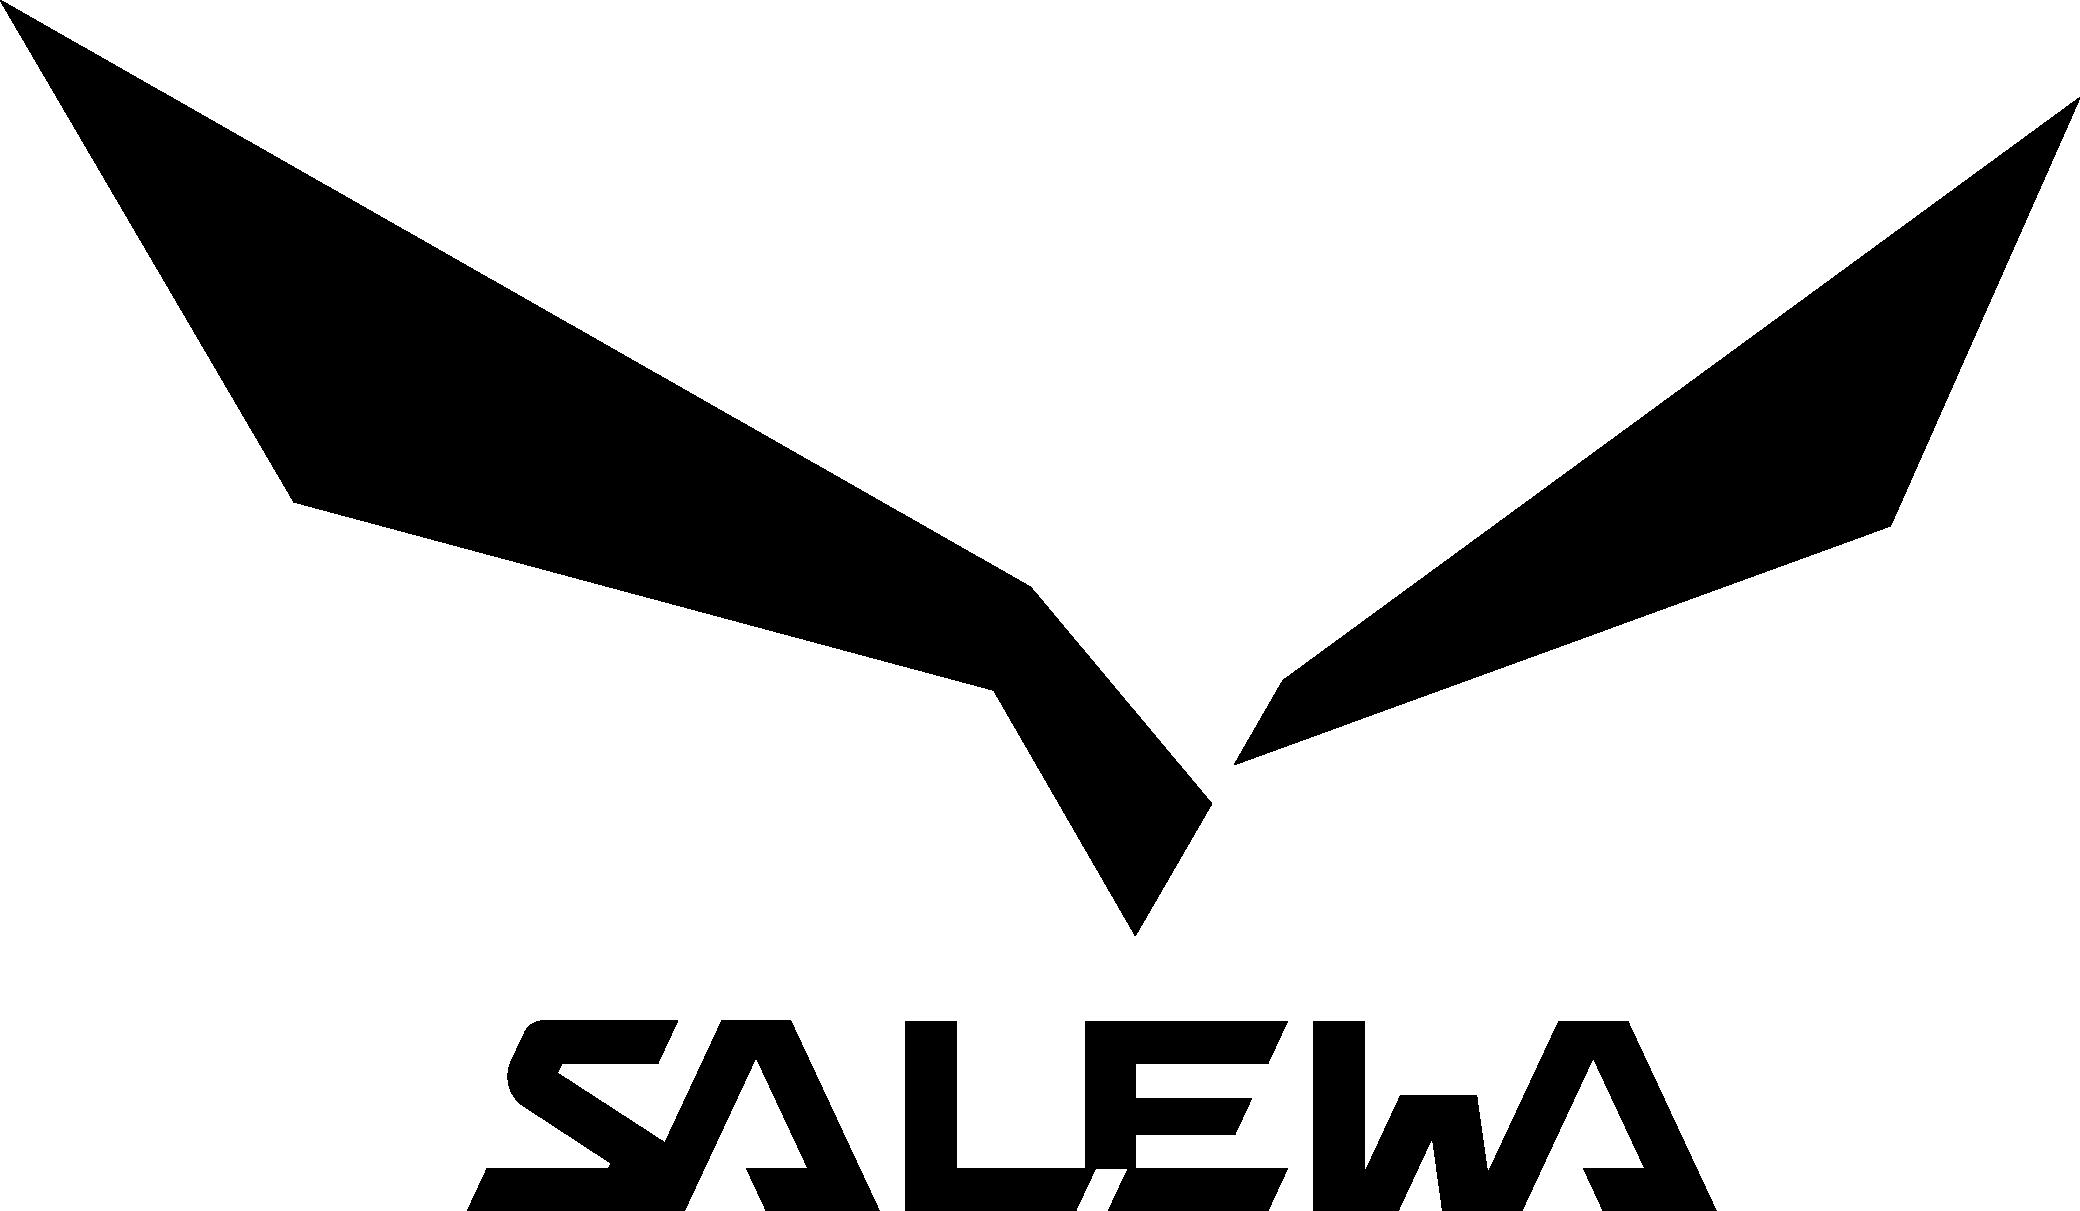 Značka - Salewa